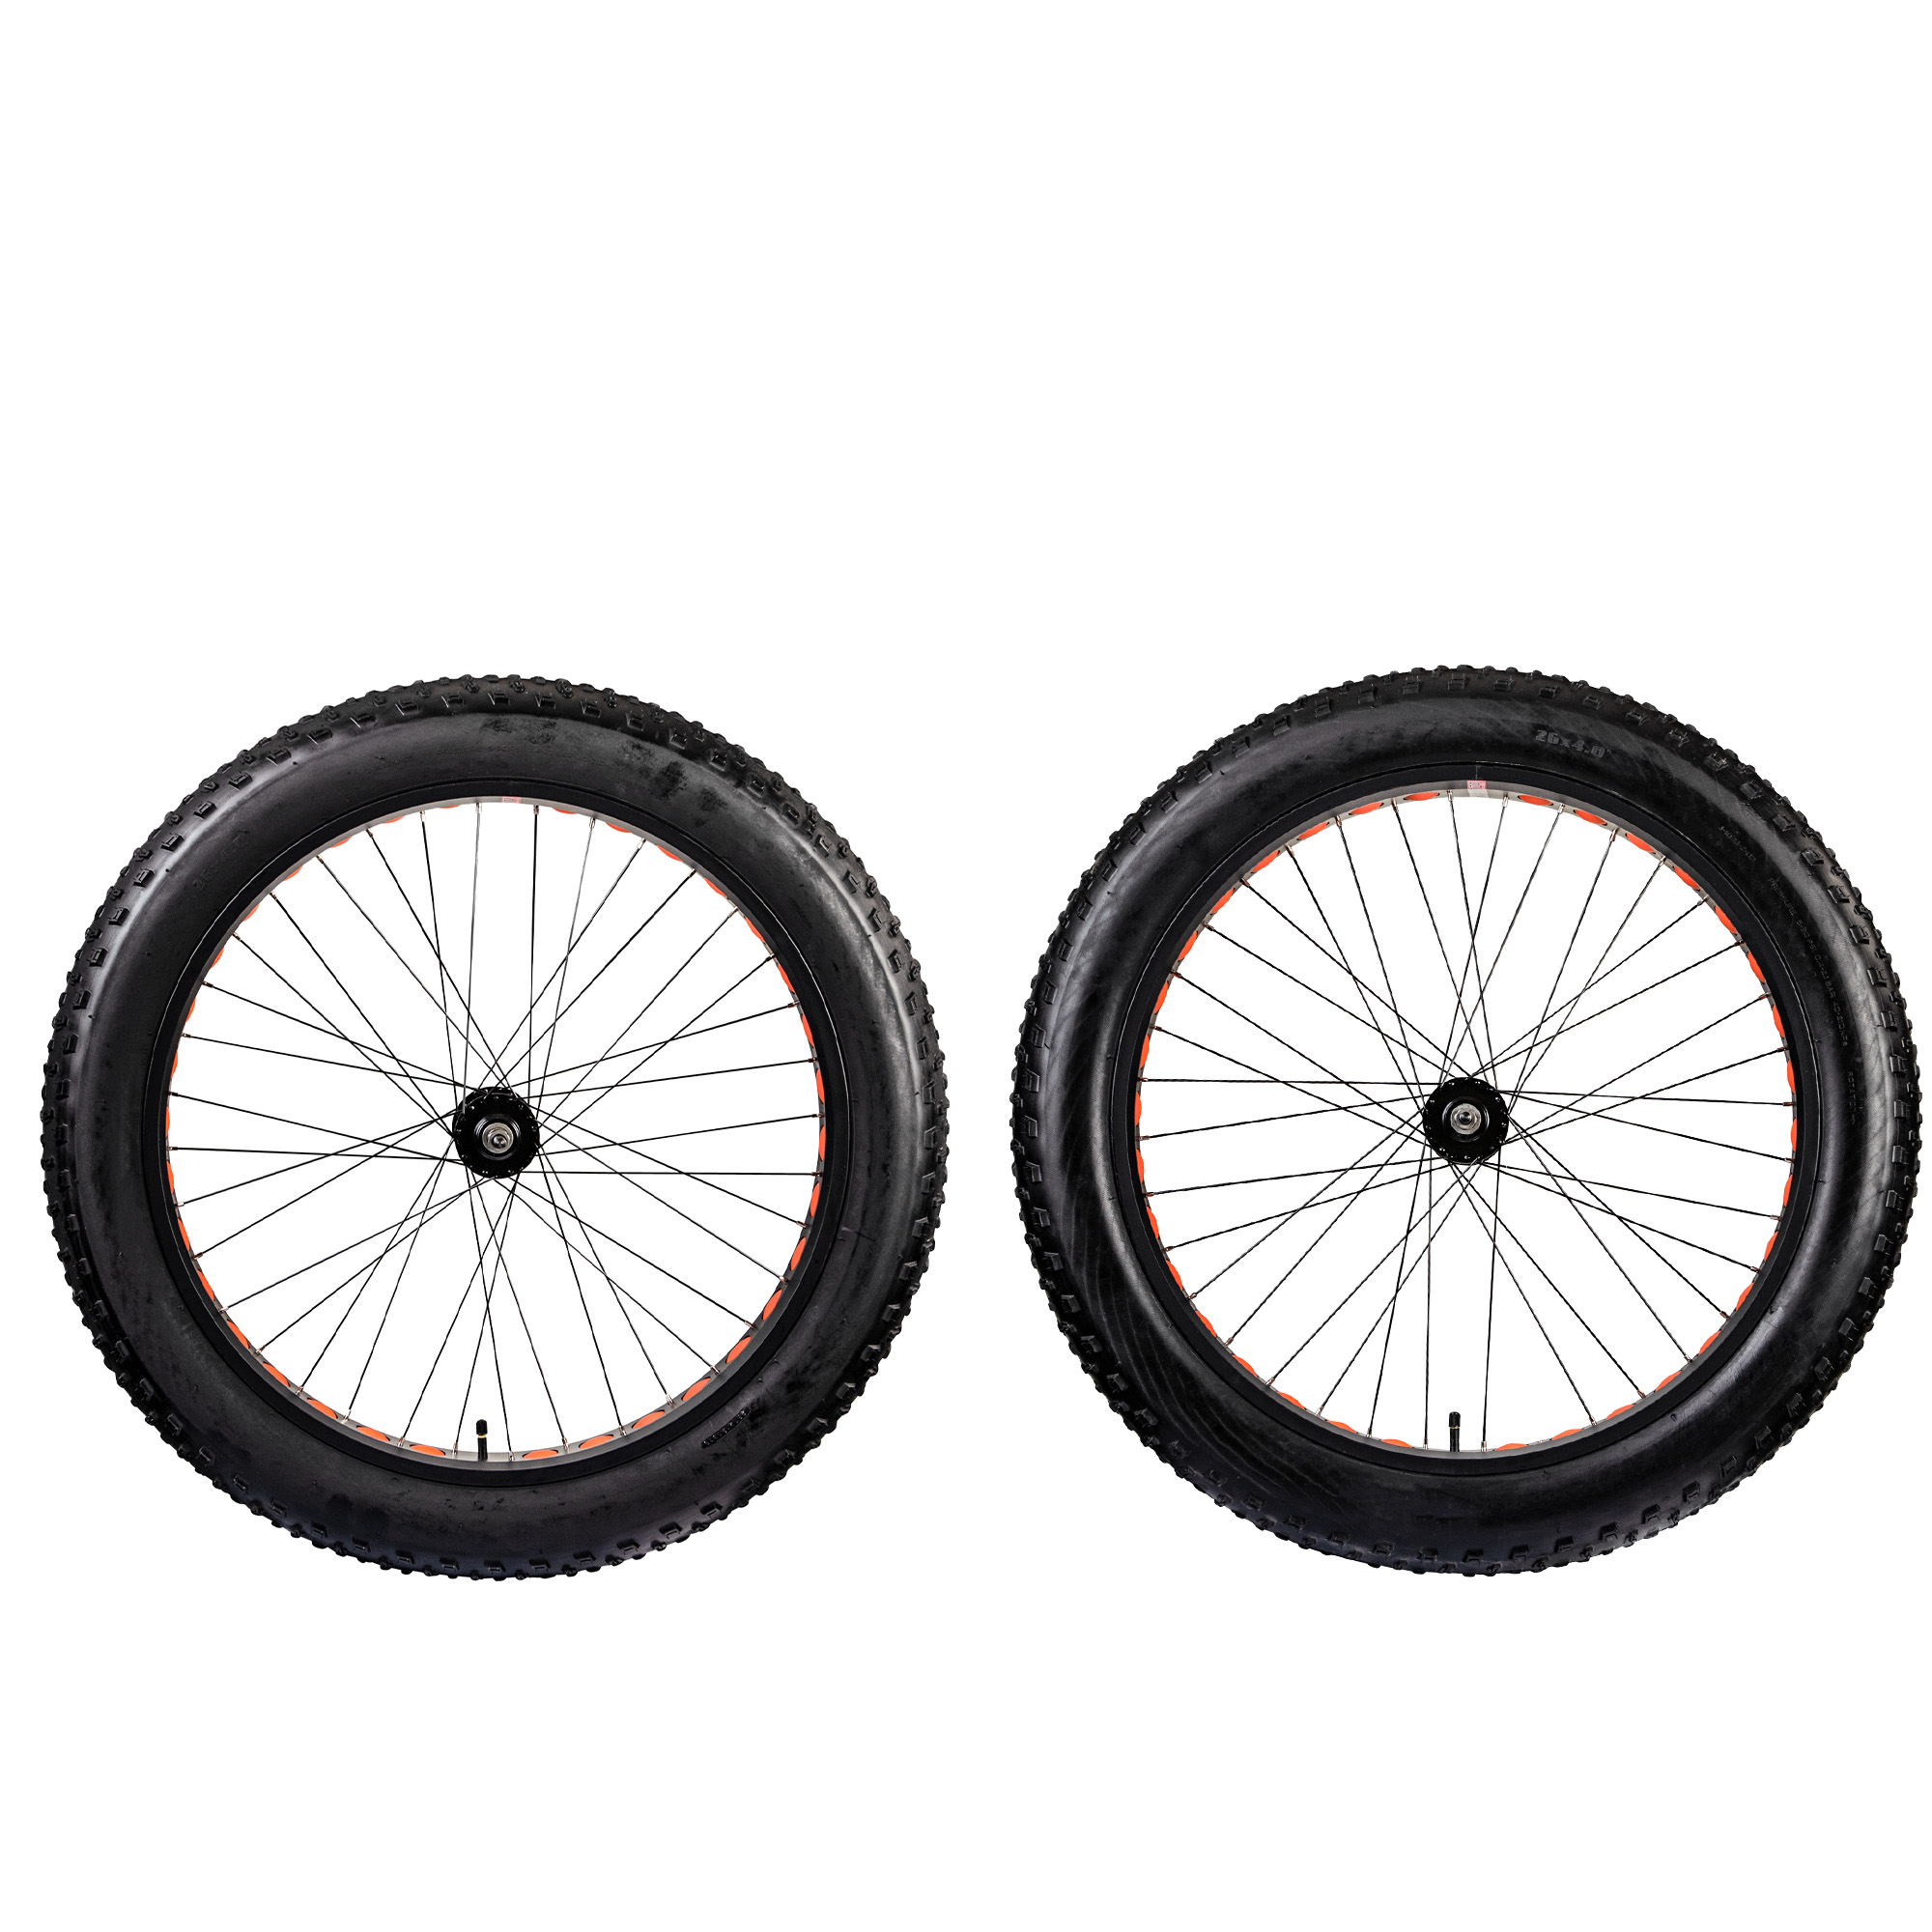 Manguera fatbike 26 x 3,5-4 pulgadas bicicleta galano Fatman 4.0 bicicleta manguera AV